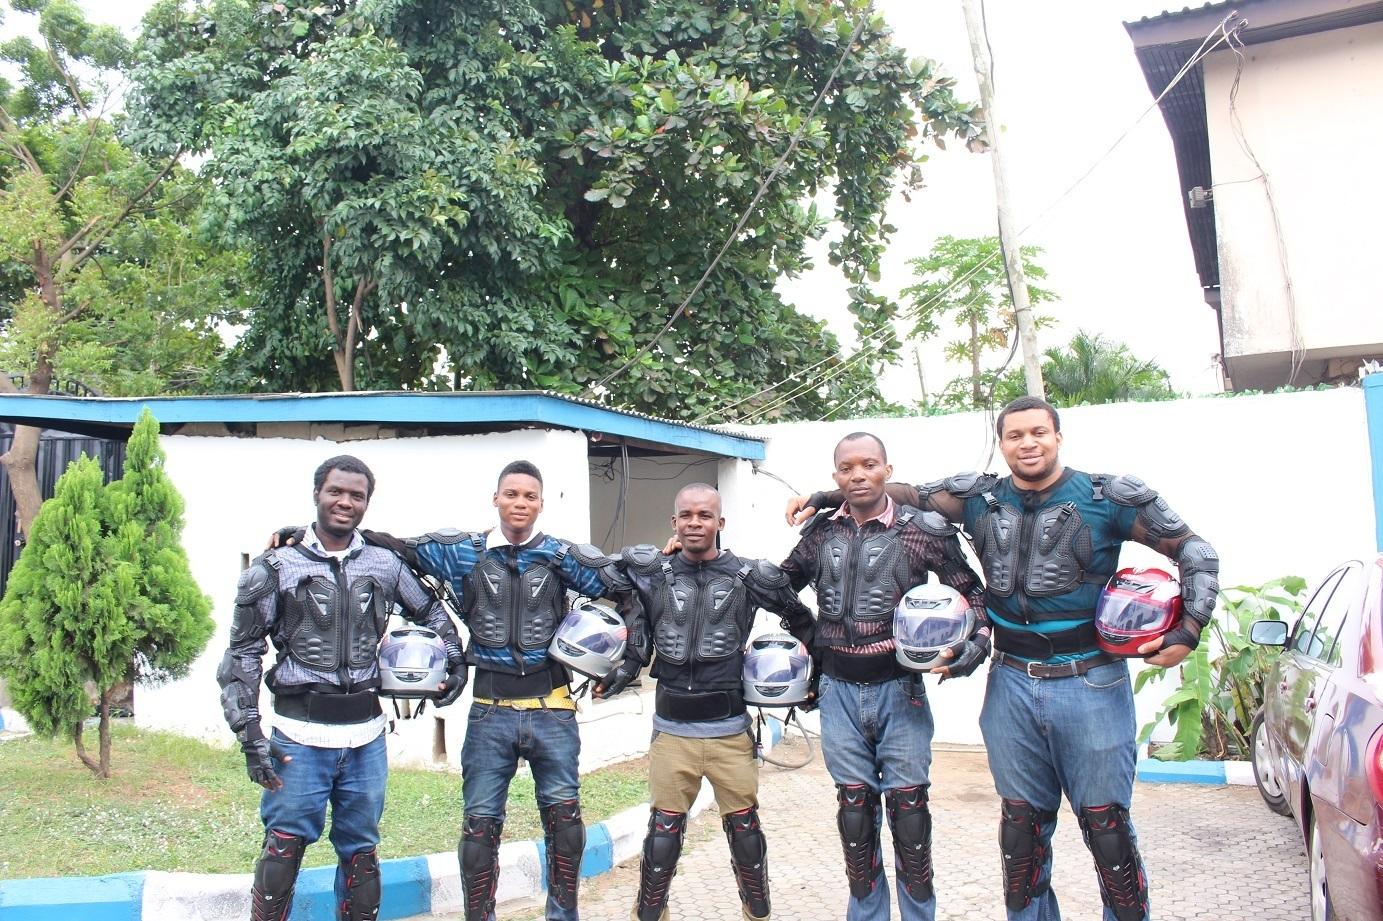 max-kick-off-team